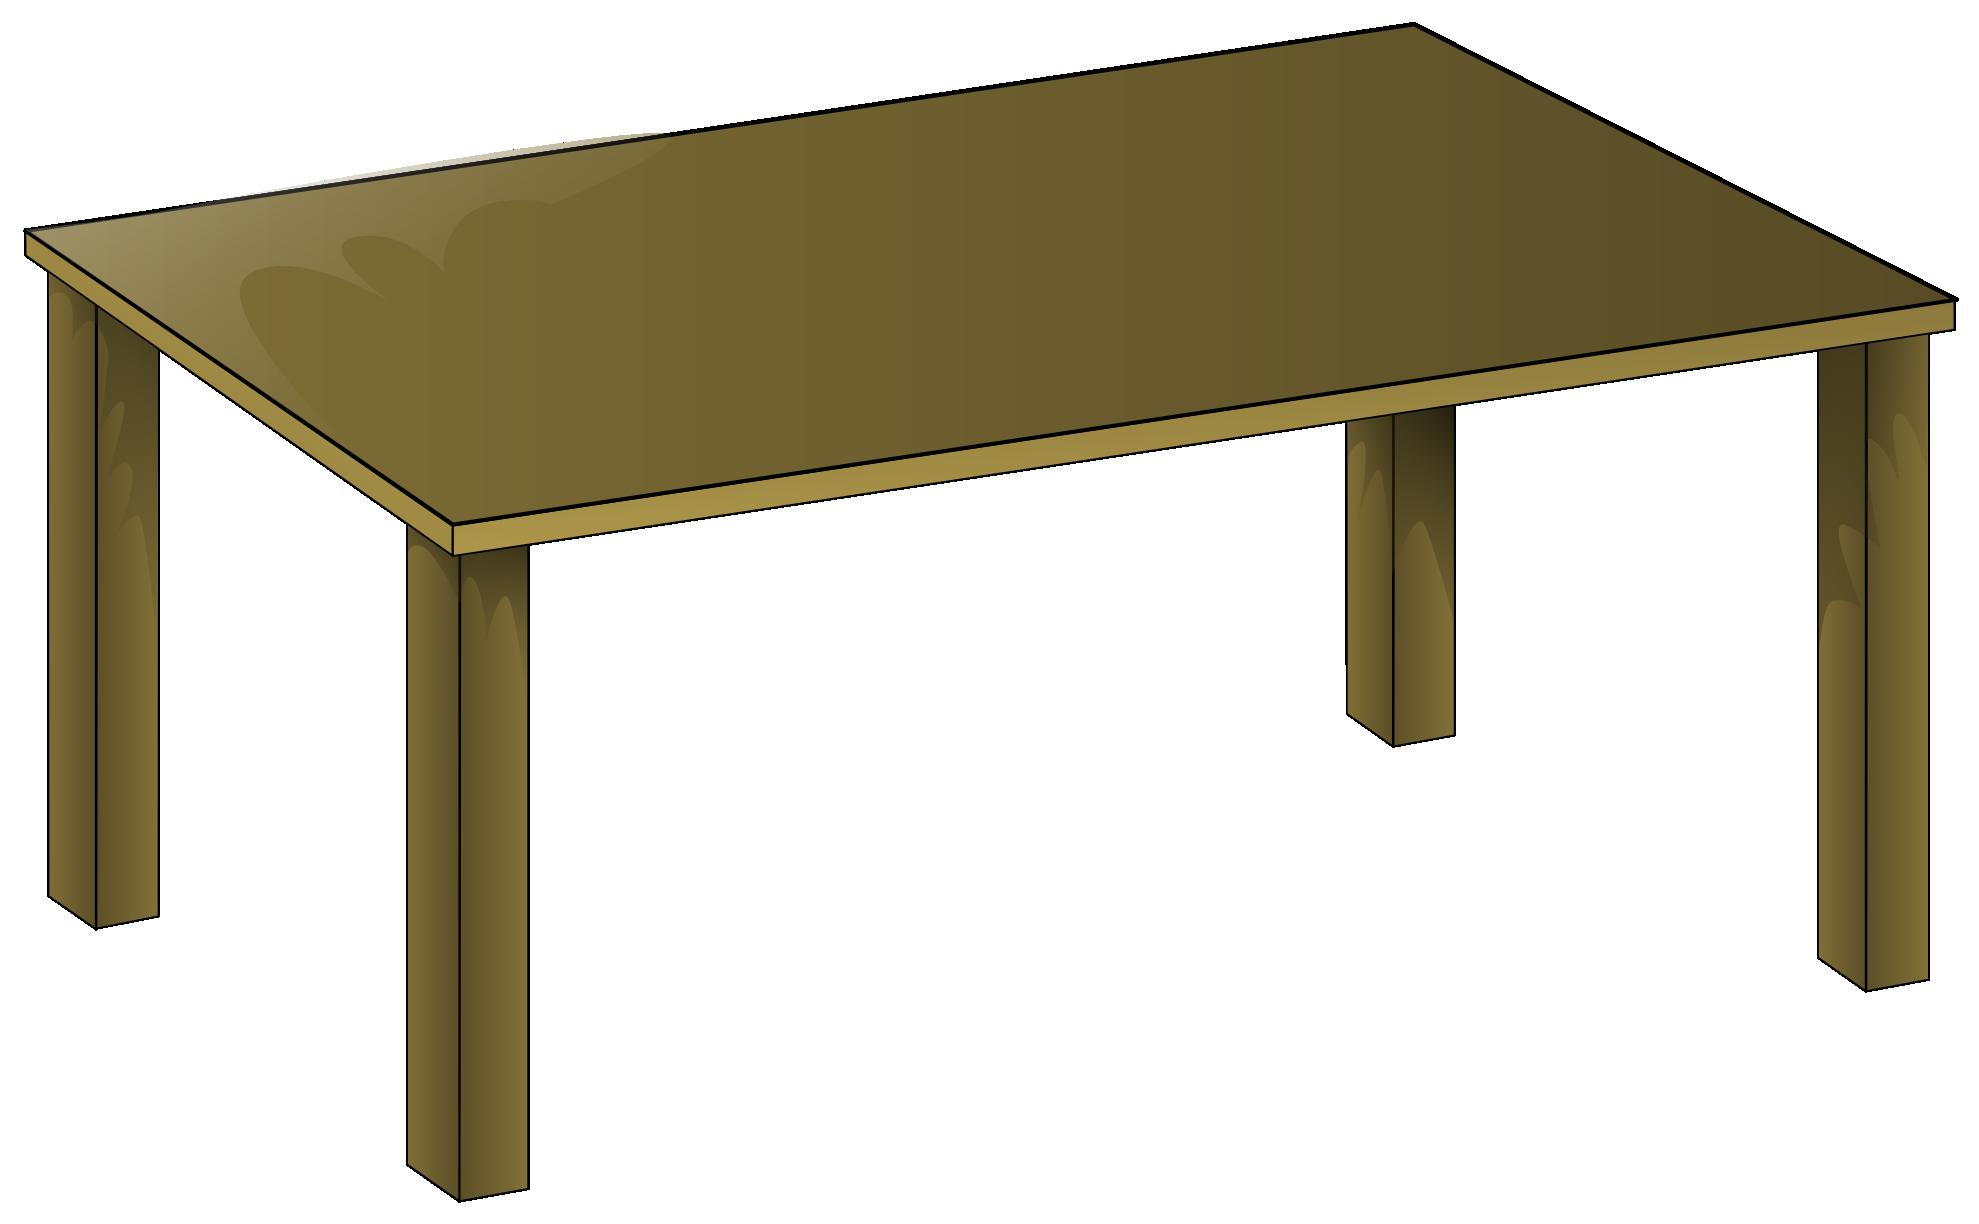 picture transparent Table clipart. Panda free images roundtableclipart